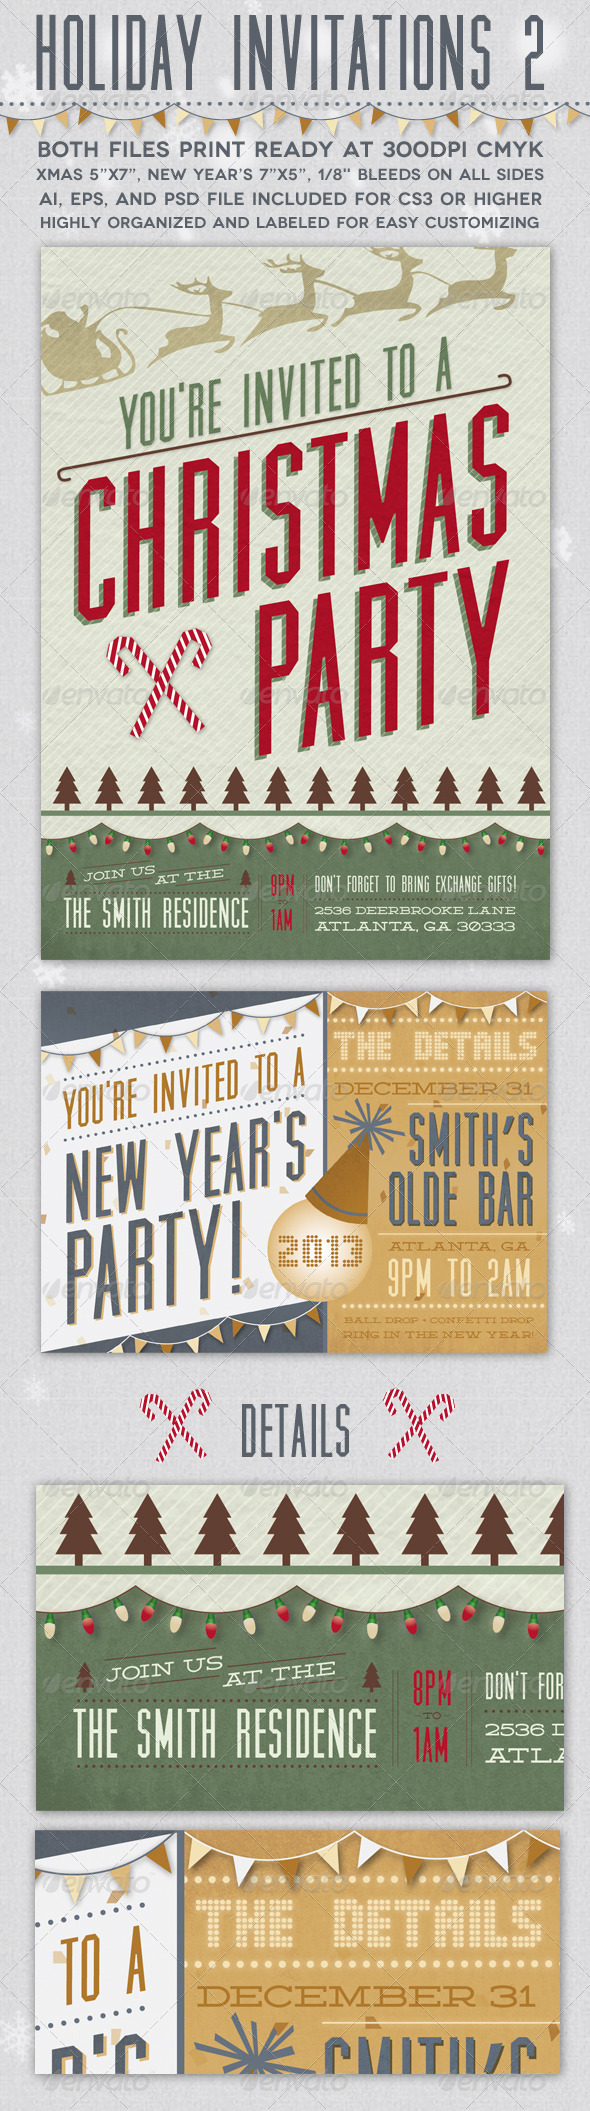 Holiday Invitations 2 - Invitations Cards & Invites